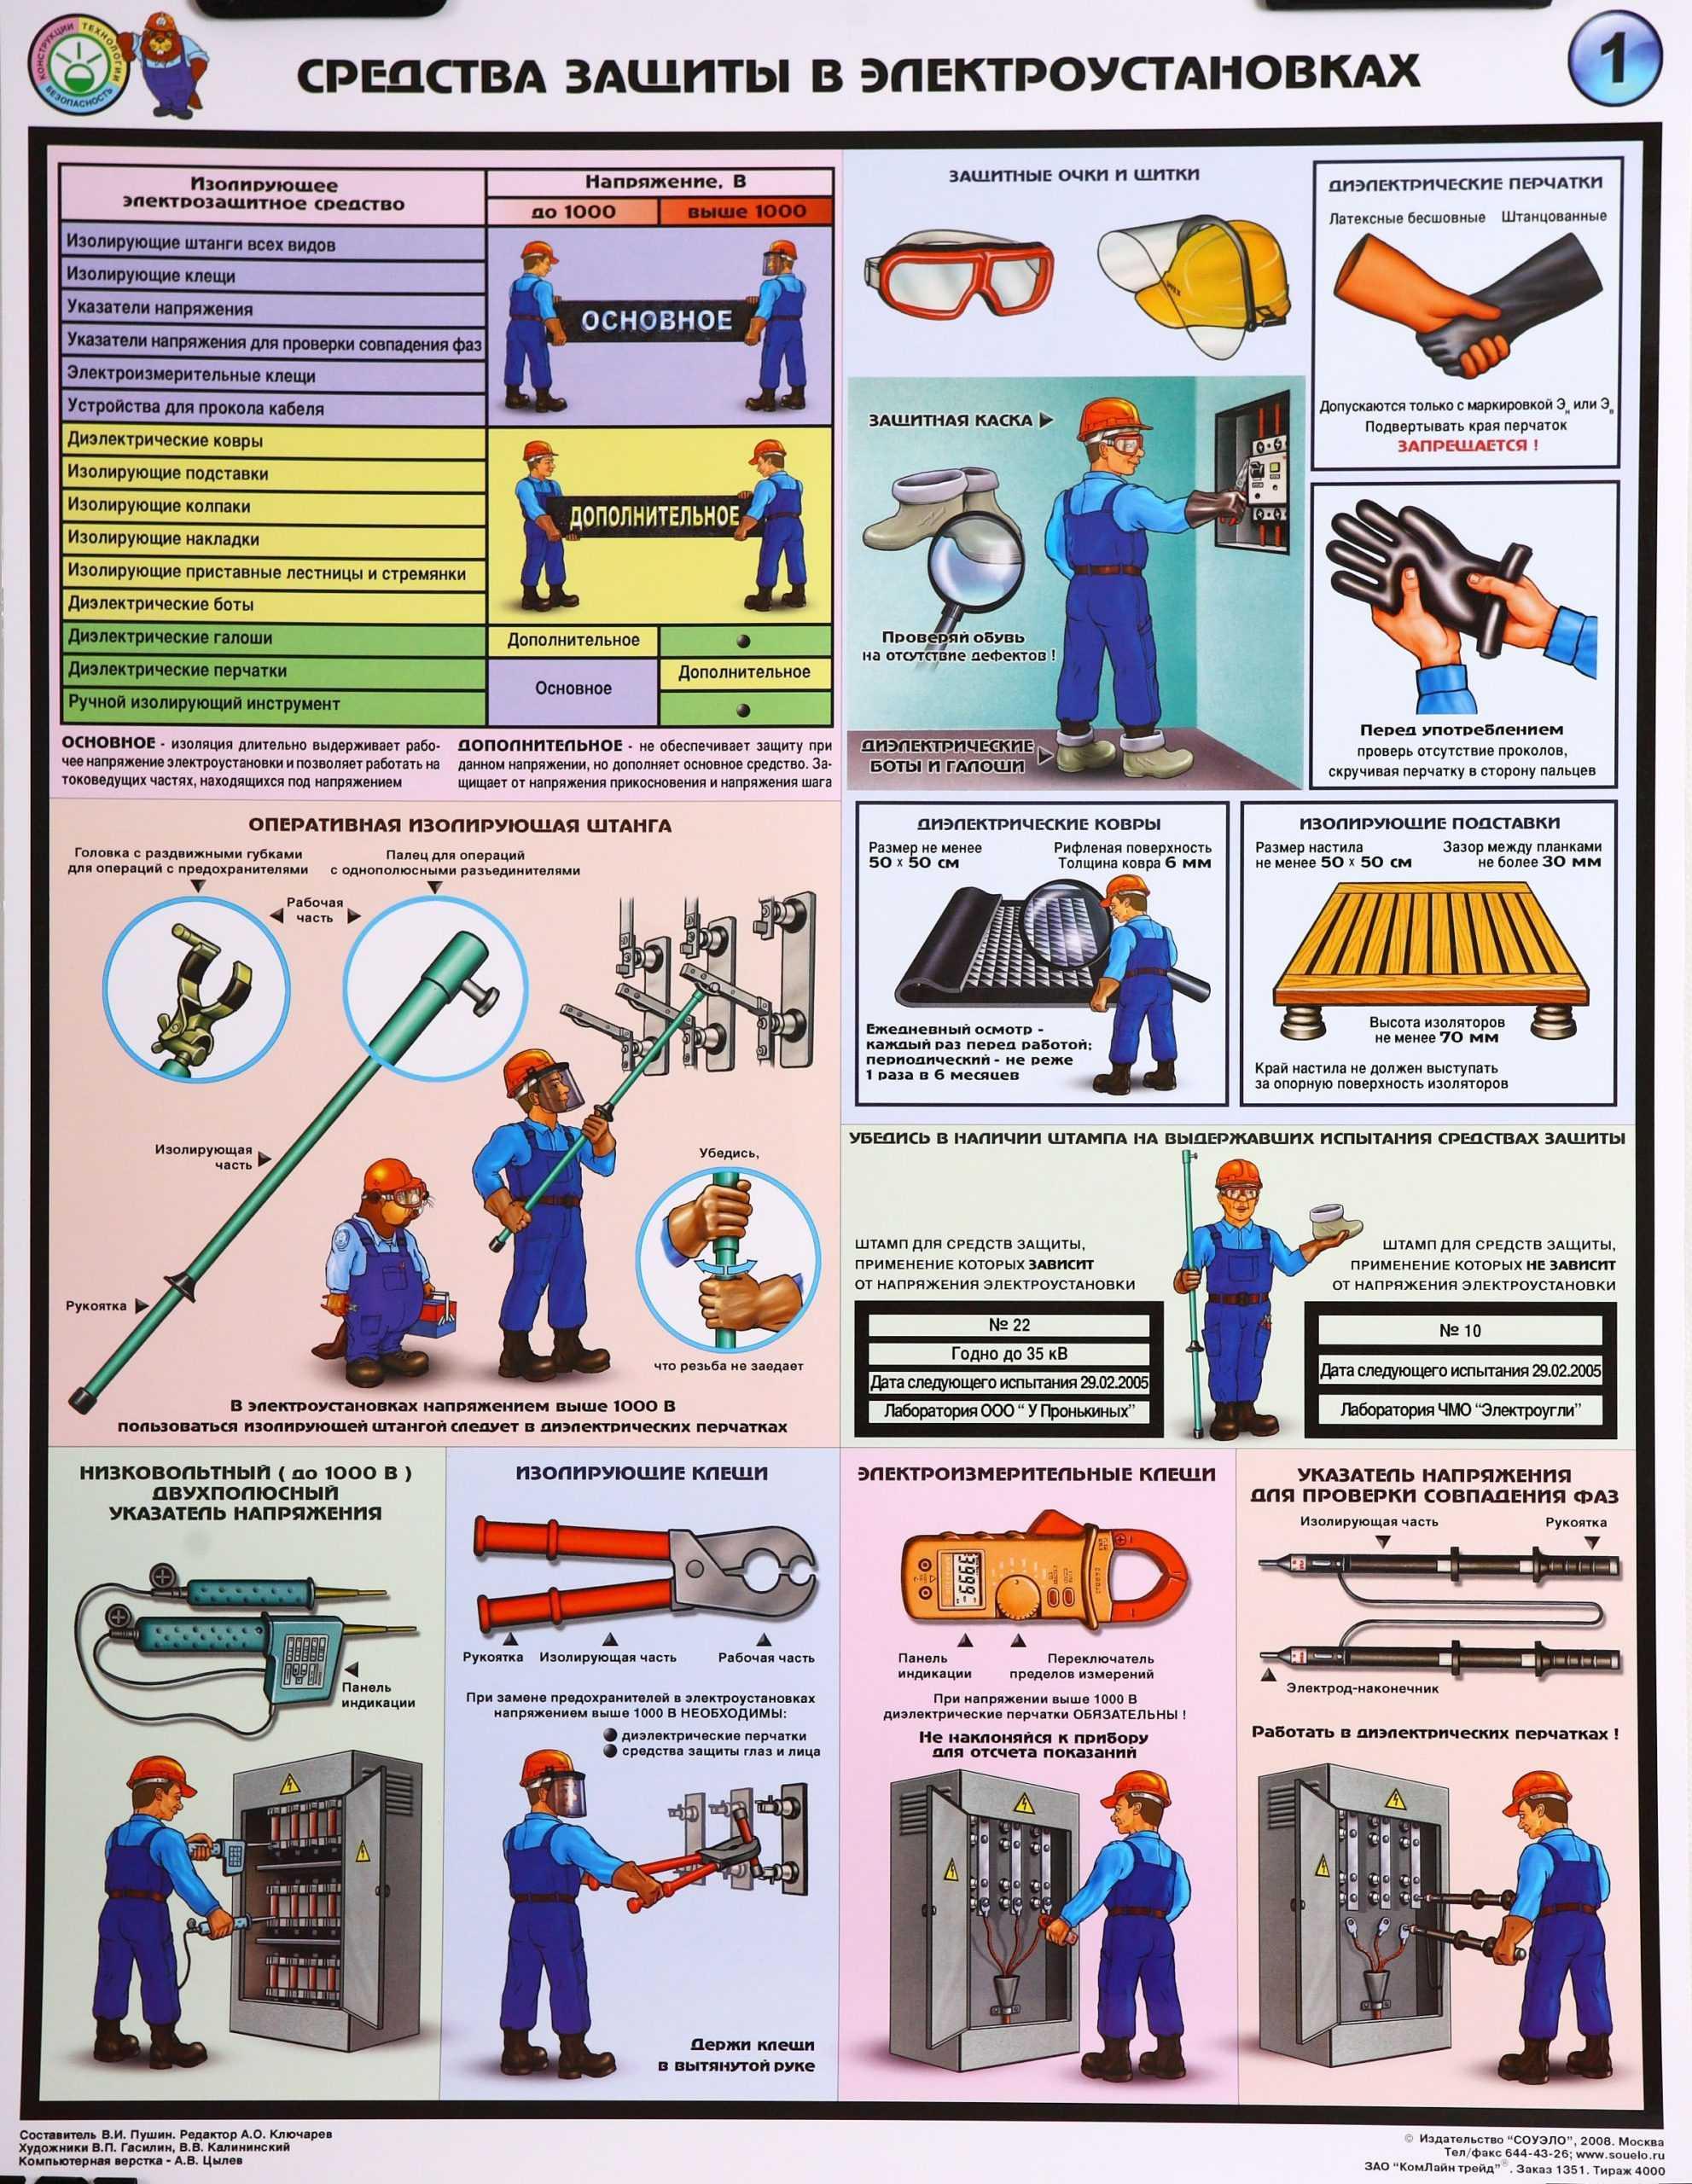 технические мероприятия в электроустановках